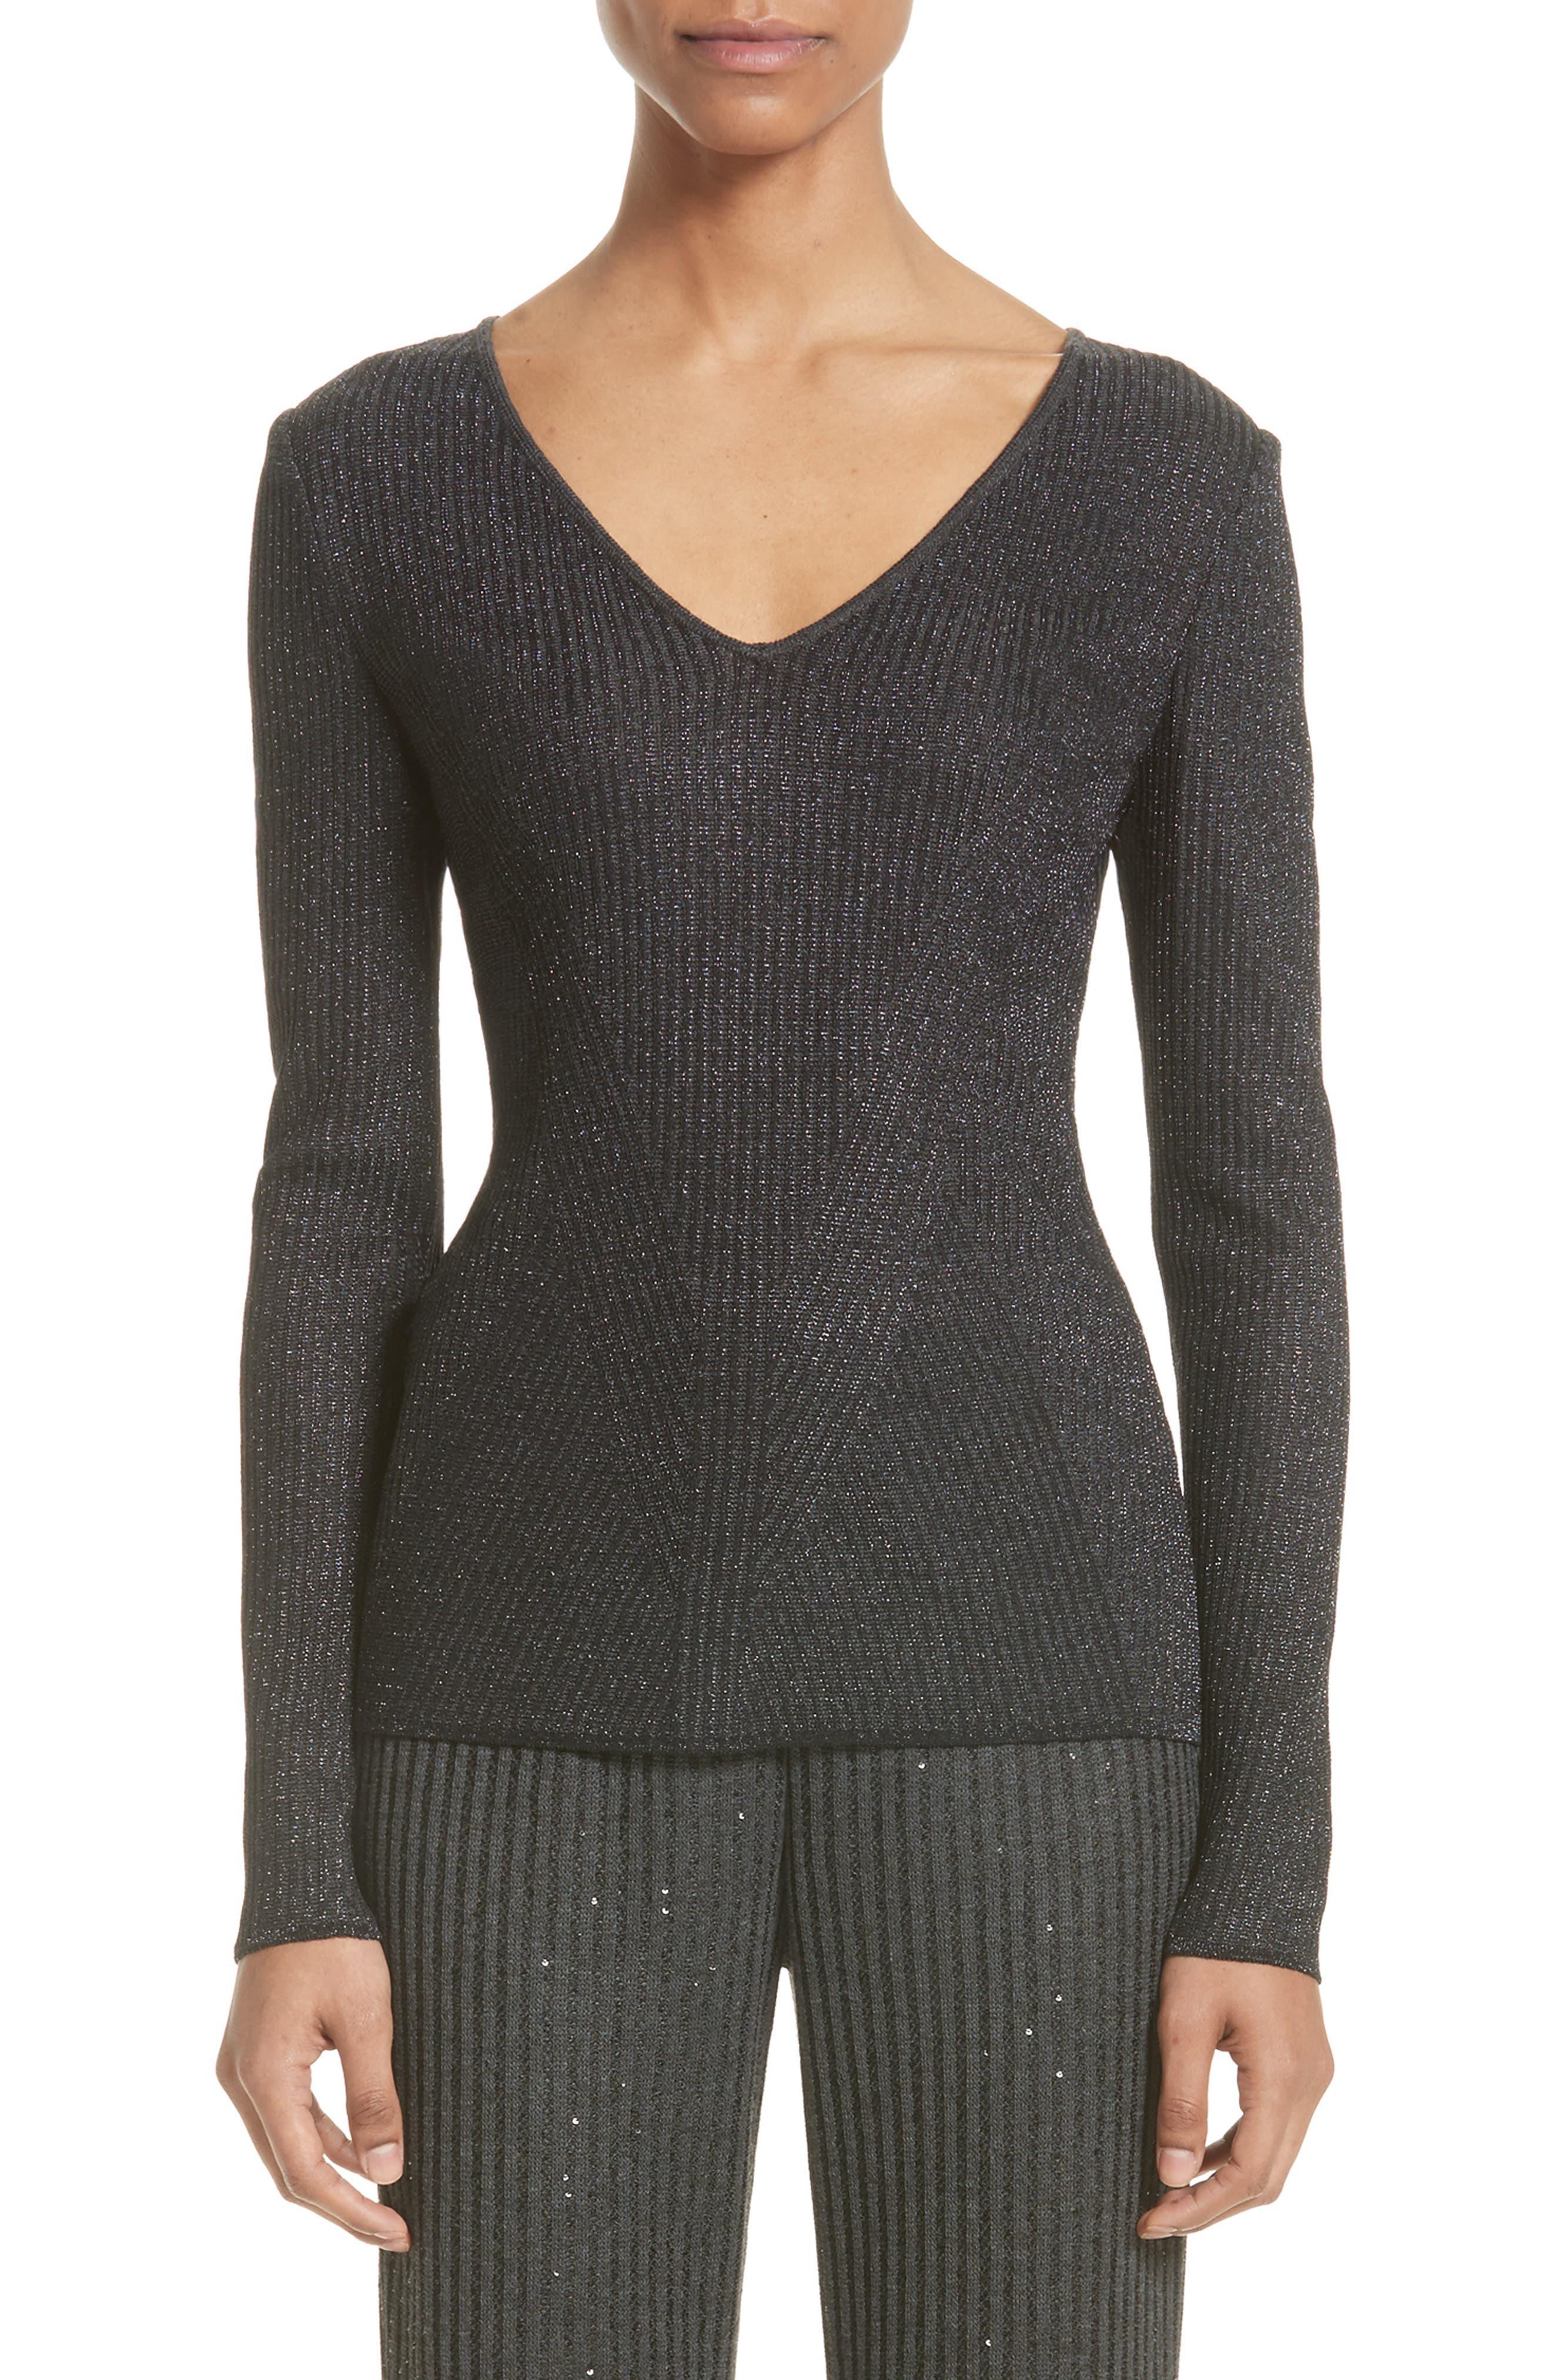 Engineered Rib Sparkle Knit Sweater,                         Main,                         color, Hematite Melange